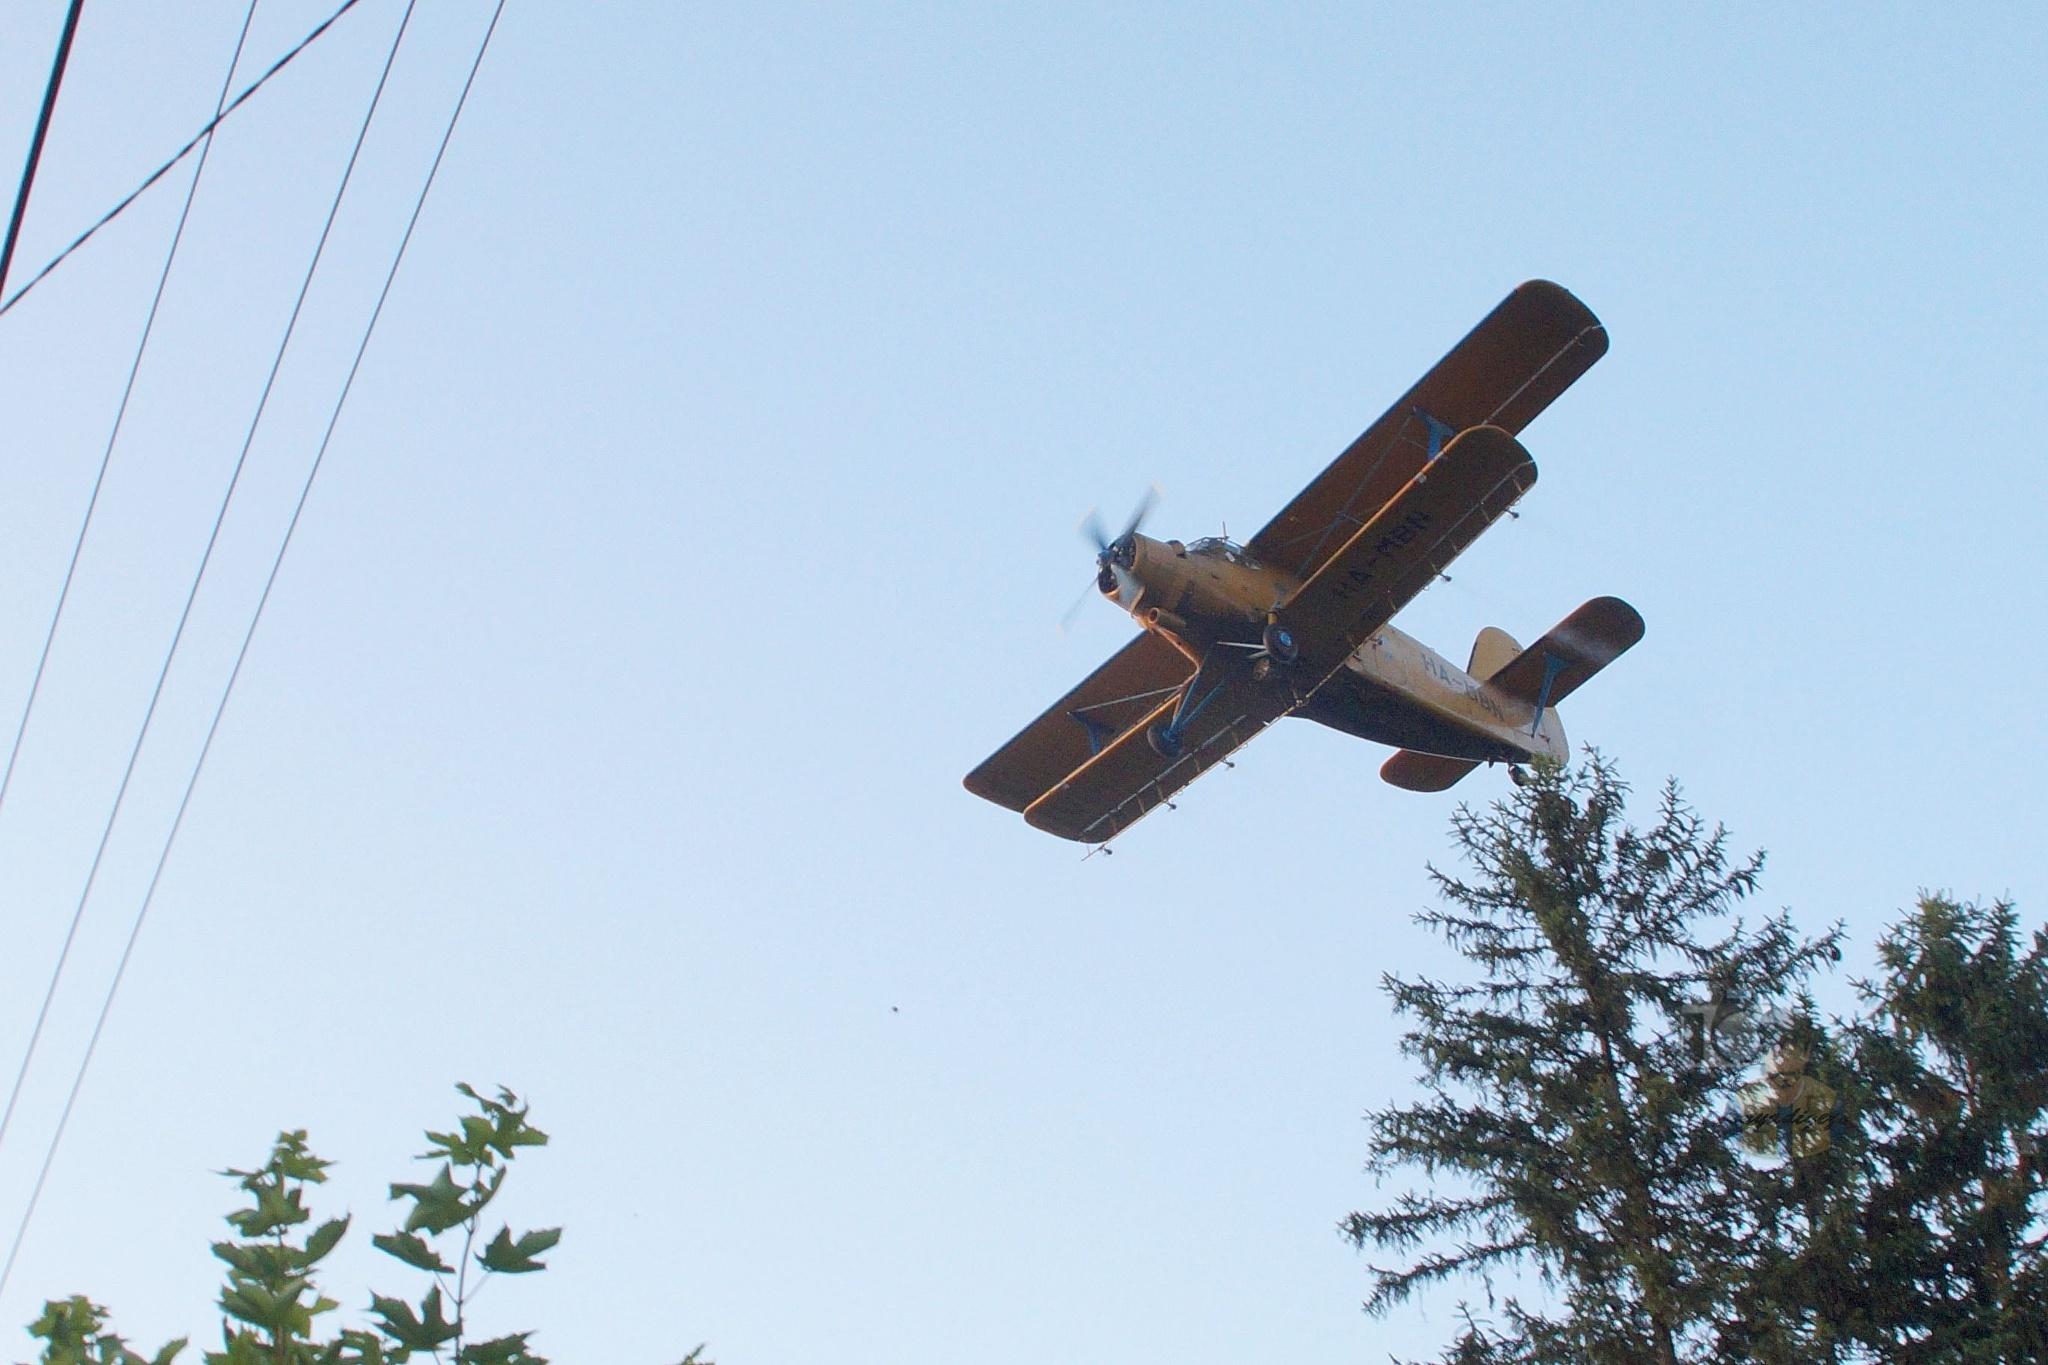 June 23,16. mosquito control with Antonov An-2 #2 by hunyadigeza